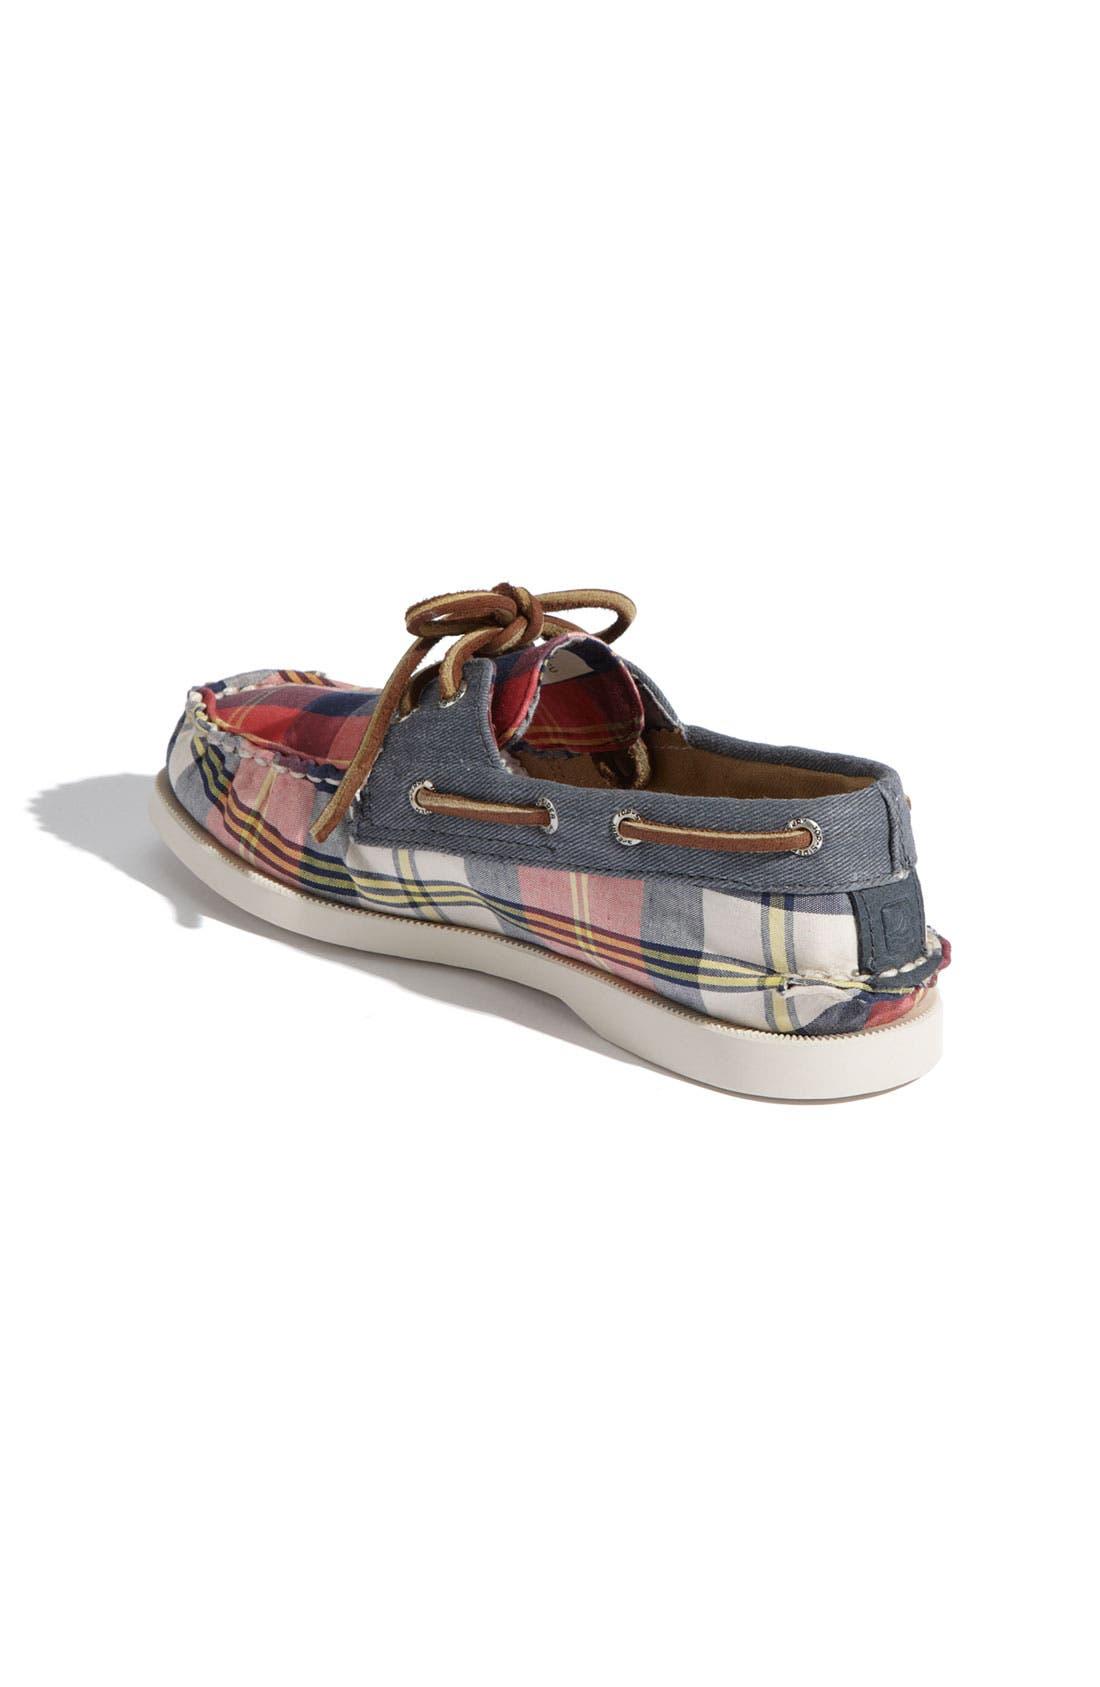 Alternate Image 2  - Sperry Top-Sider® 'Authentic Original Plaid' Boat Shoe (Walker & Toddler)